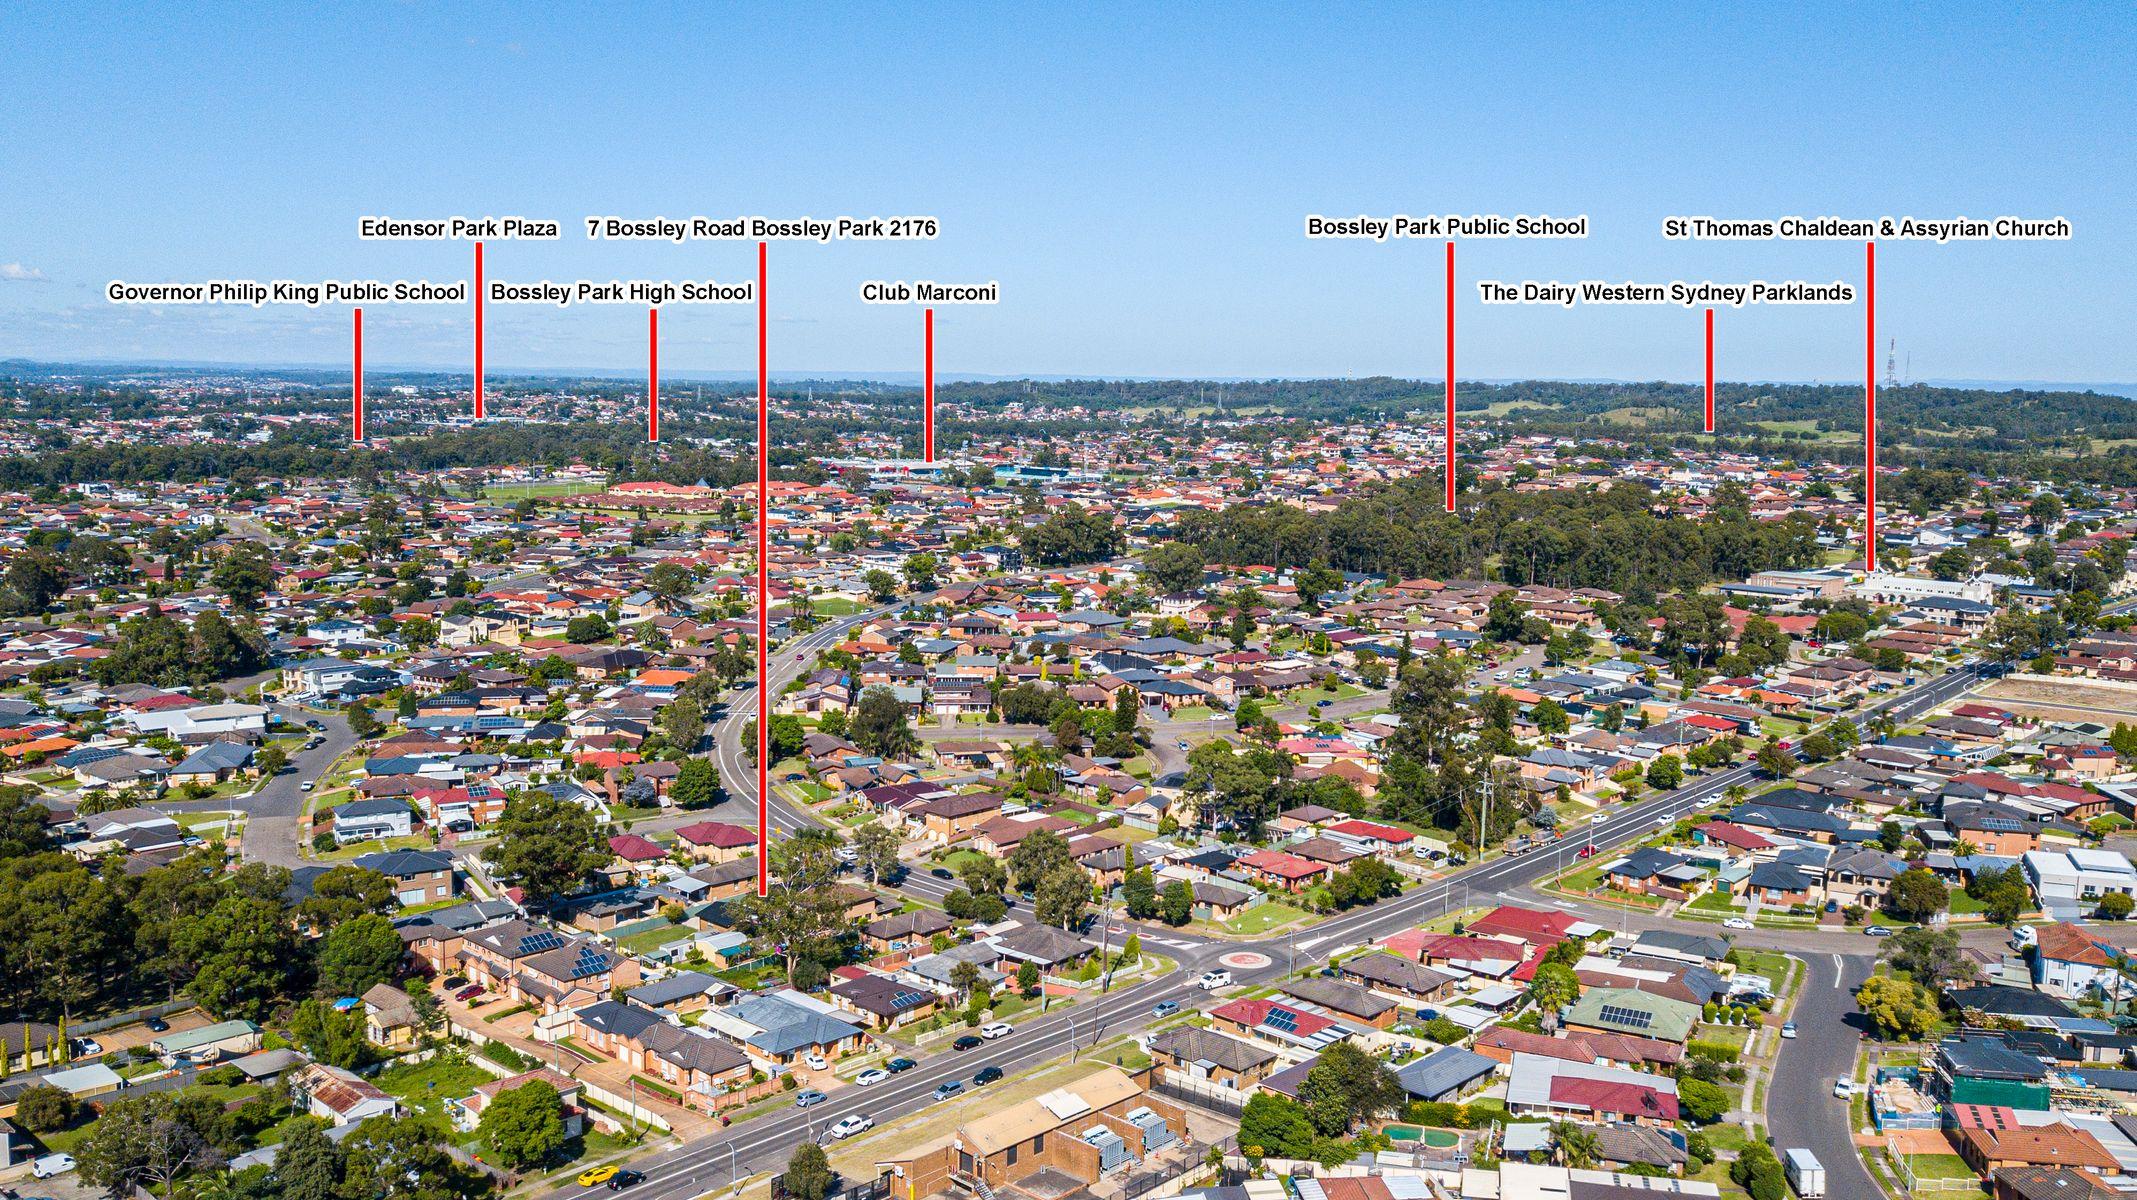 7 Bossley Road, Bossley Park, NSW 2176